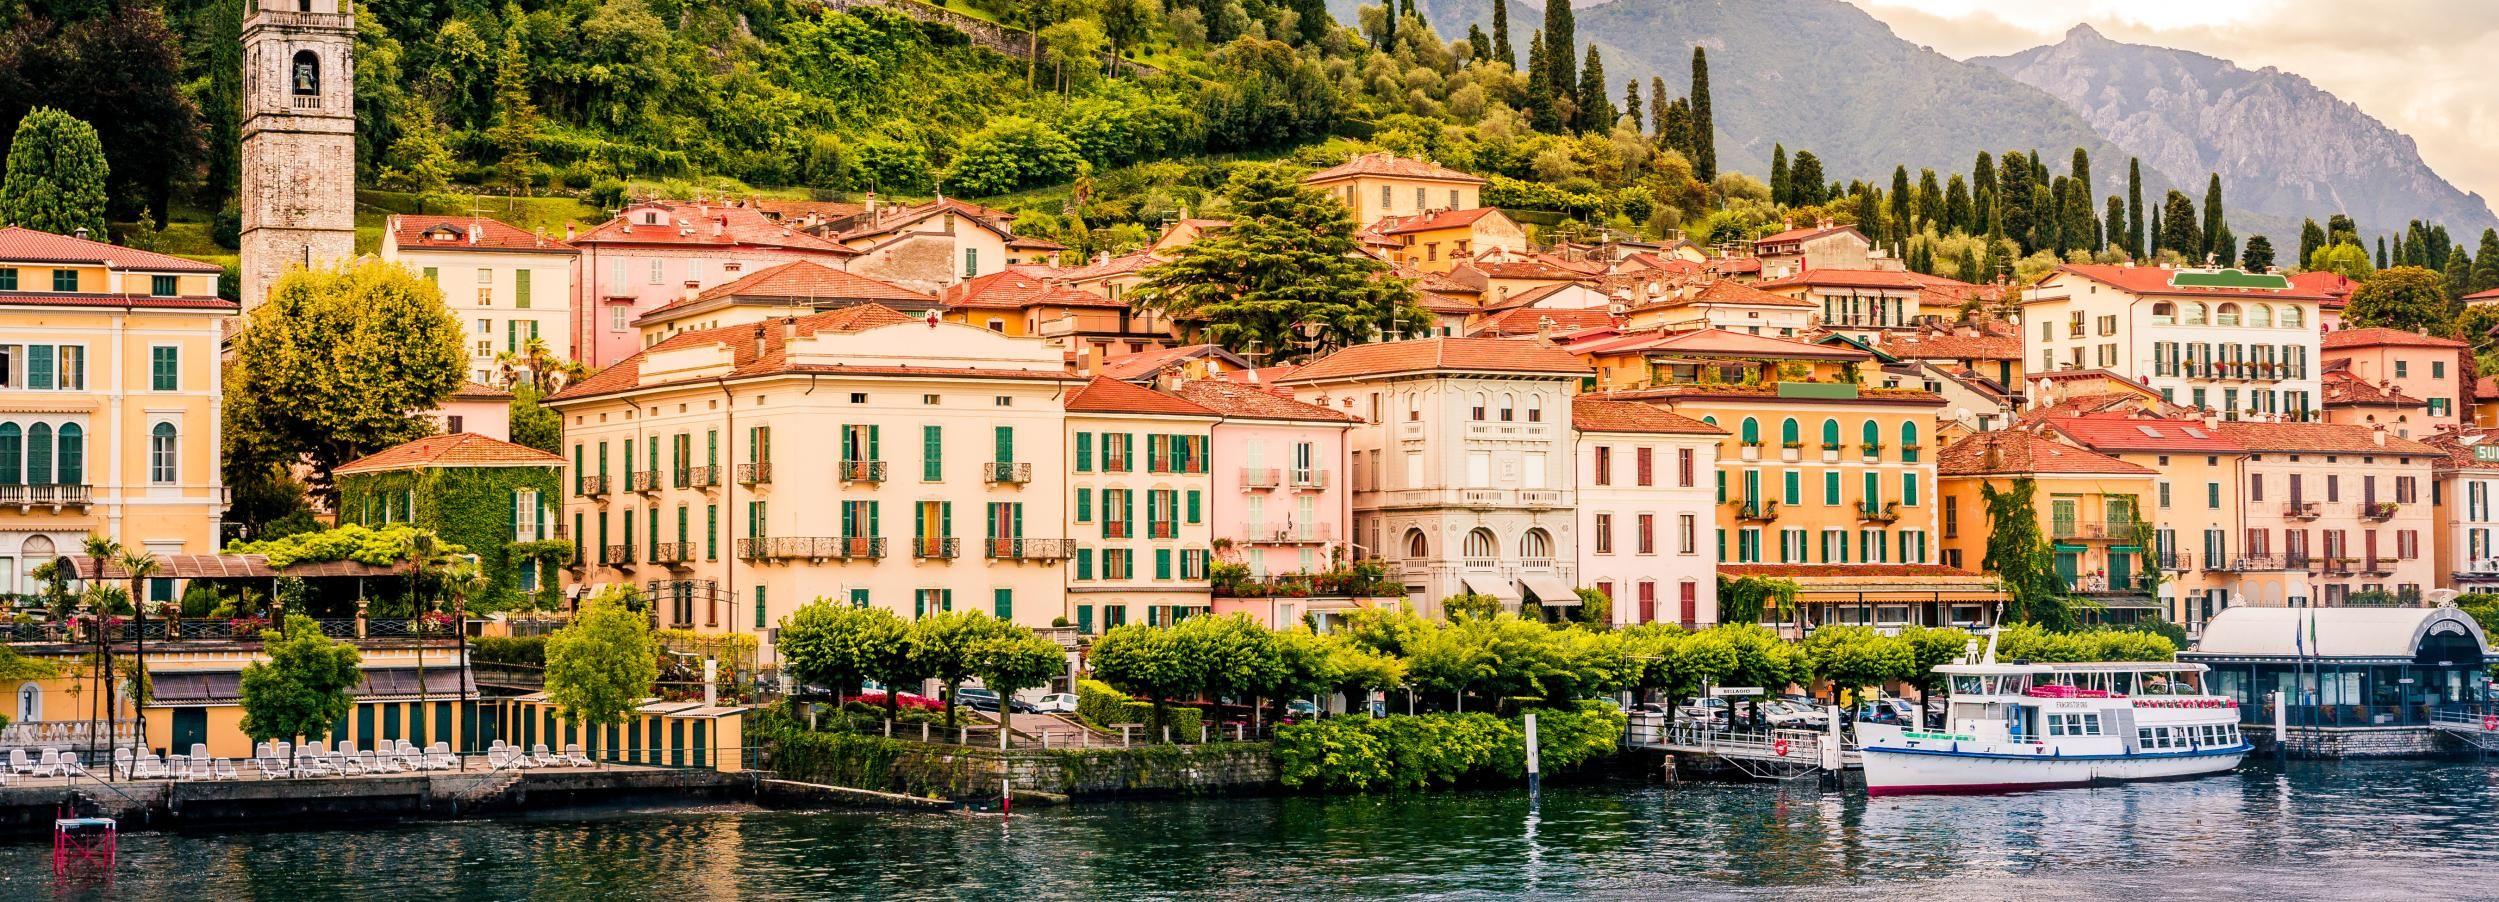 Lake Como: Luxury Bus From Milan to Visit Como and Bellagio